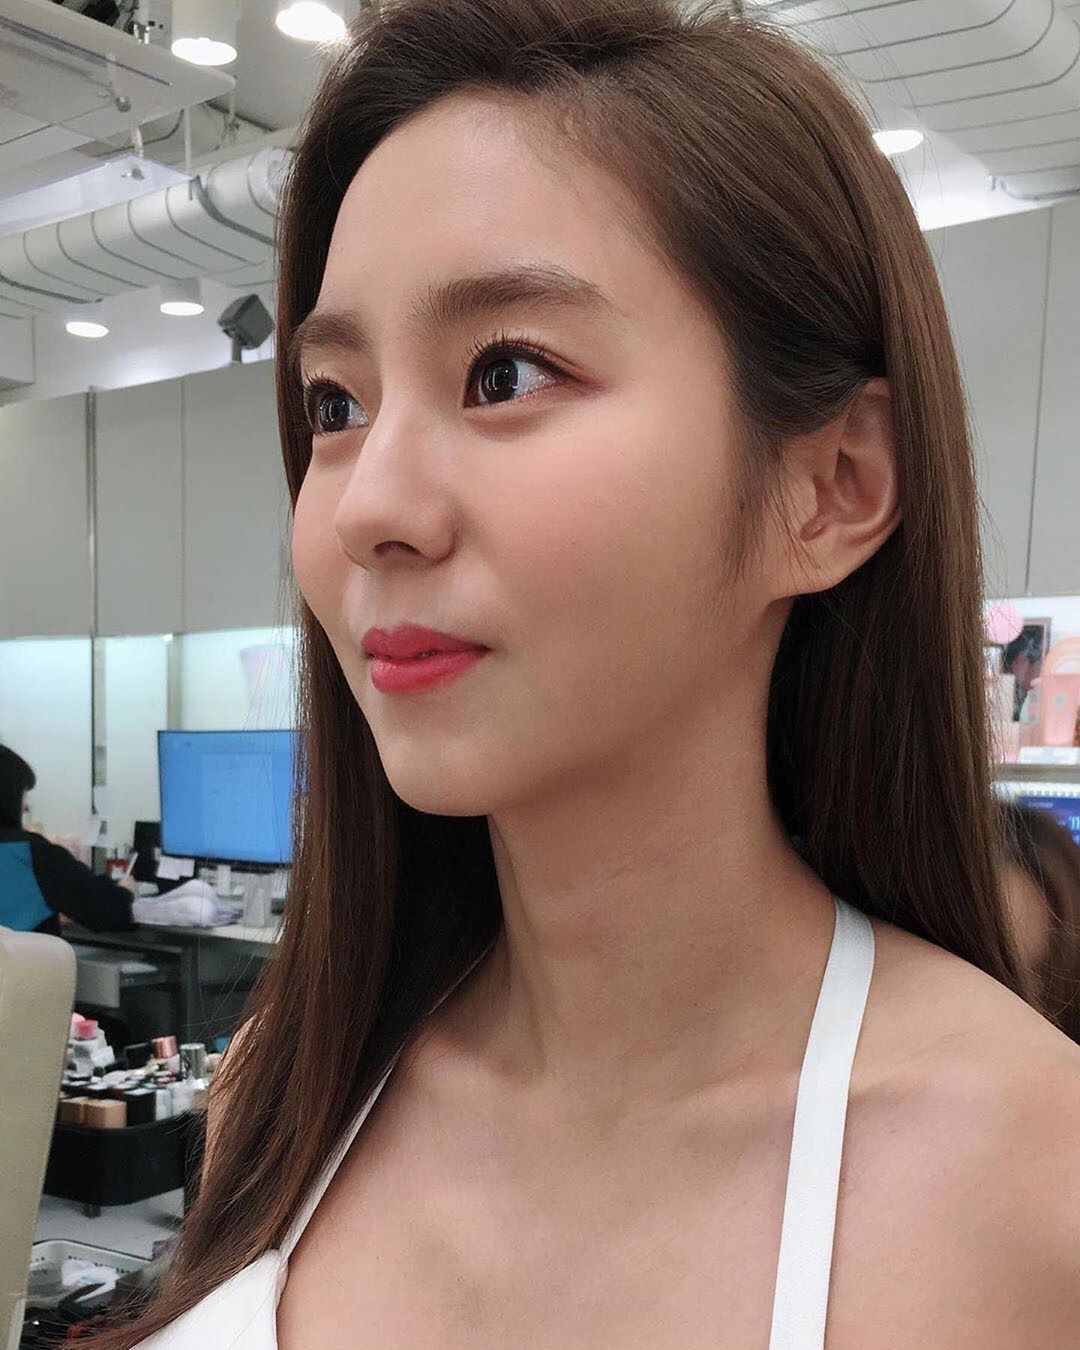 @kim_uieing49